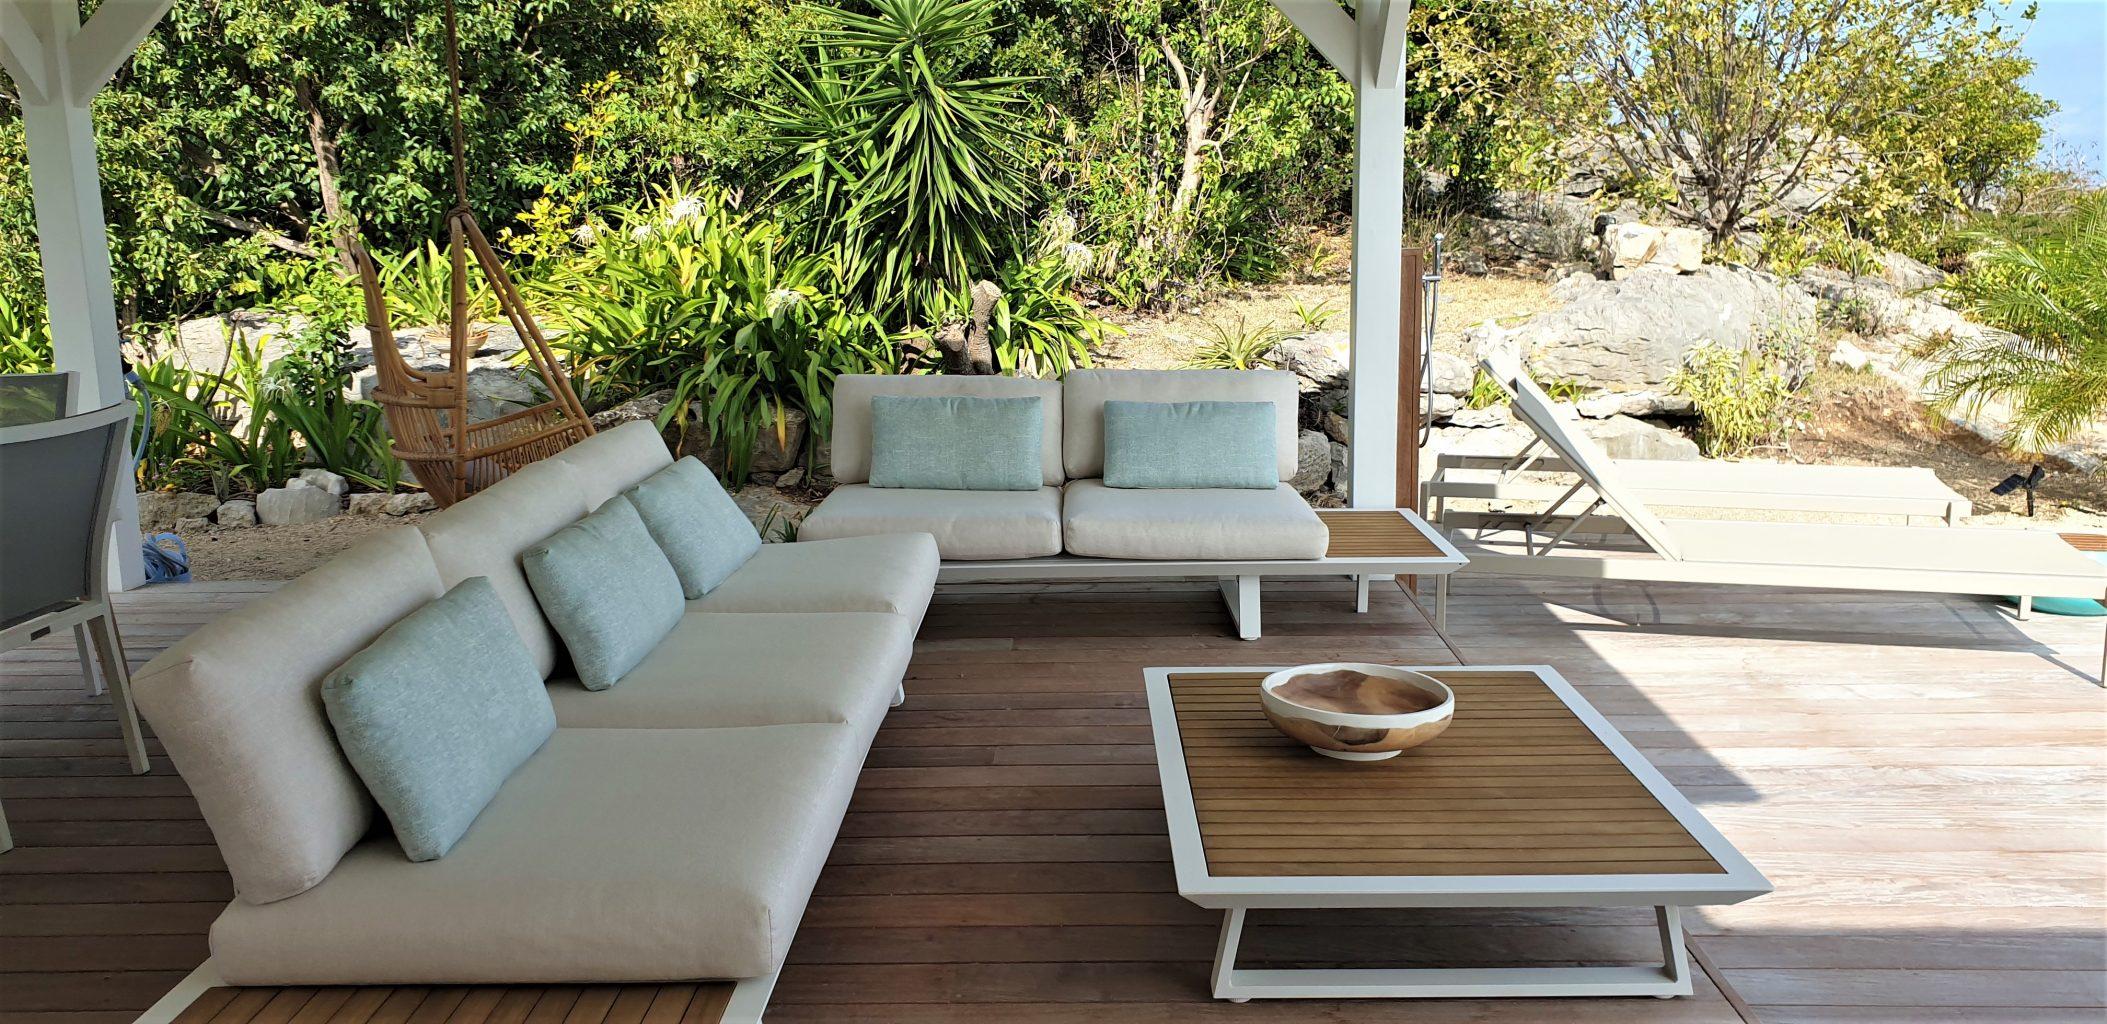 Villa Marris - Modern Villa Rent St Barth Lurin - Outside sitting area